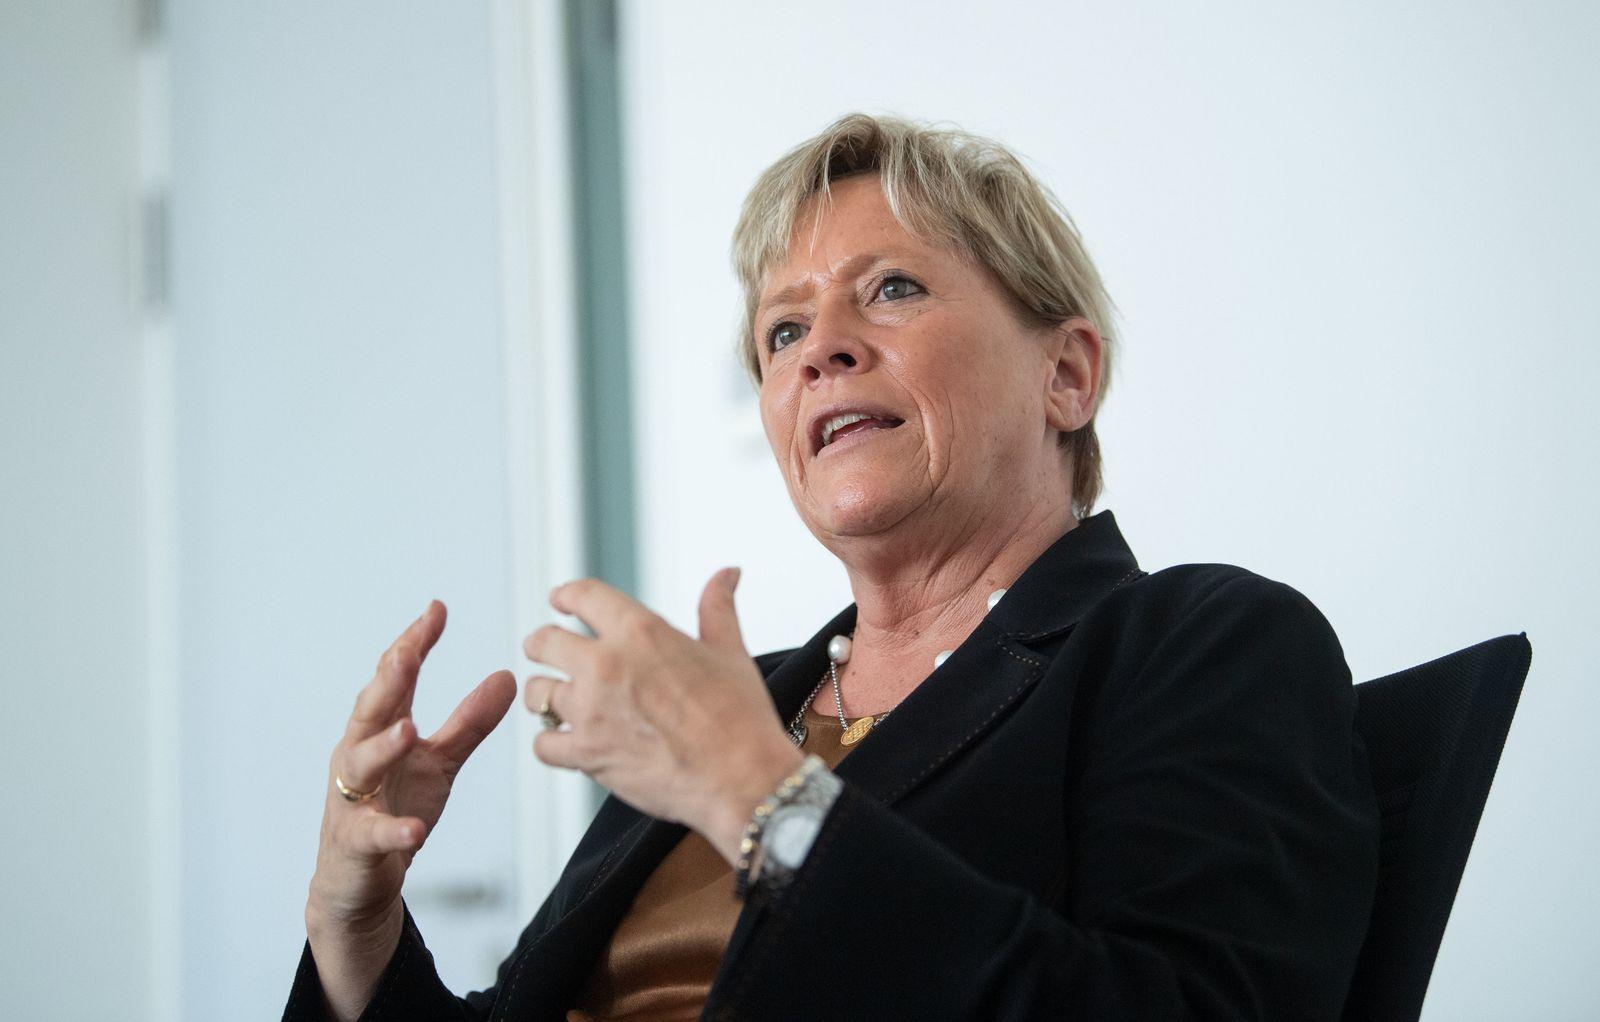 Susanne Eisenmann/ CDU